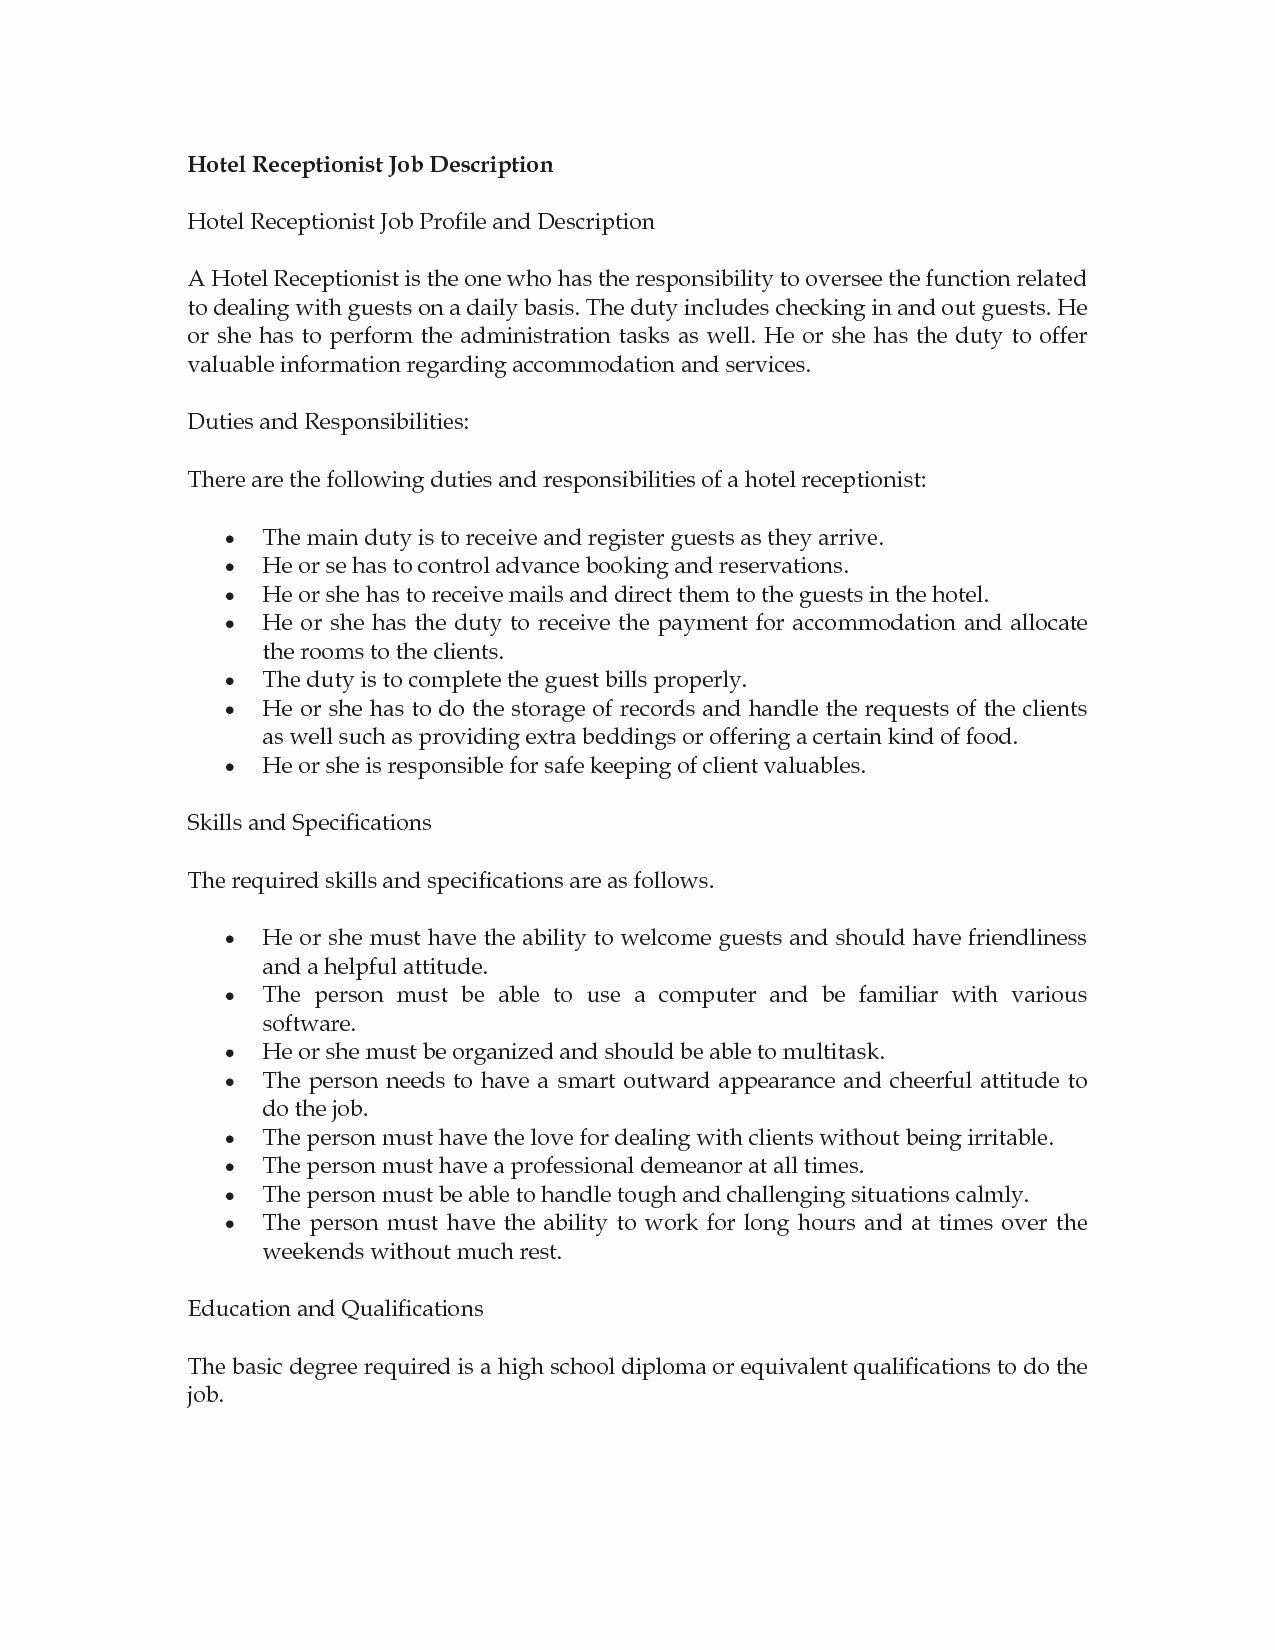 Receptionist Job Description Resume Reception Job Description Resume Receptionist Jobs Resume Job Resume